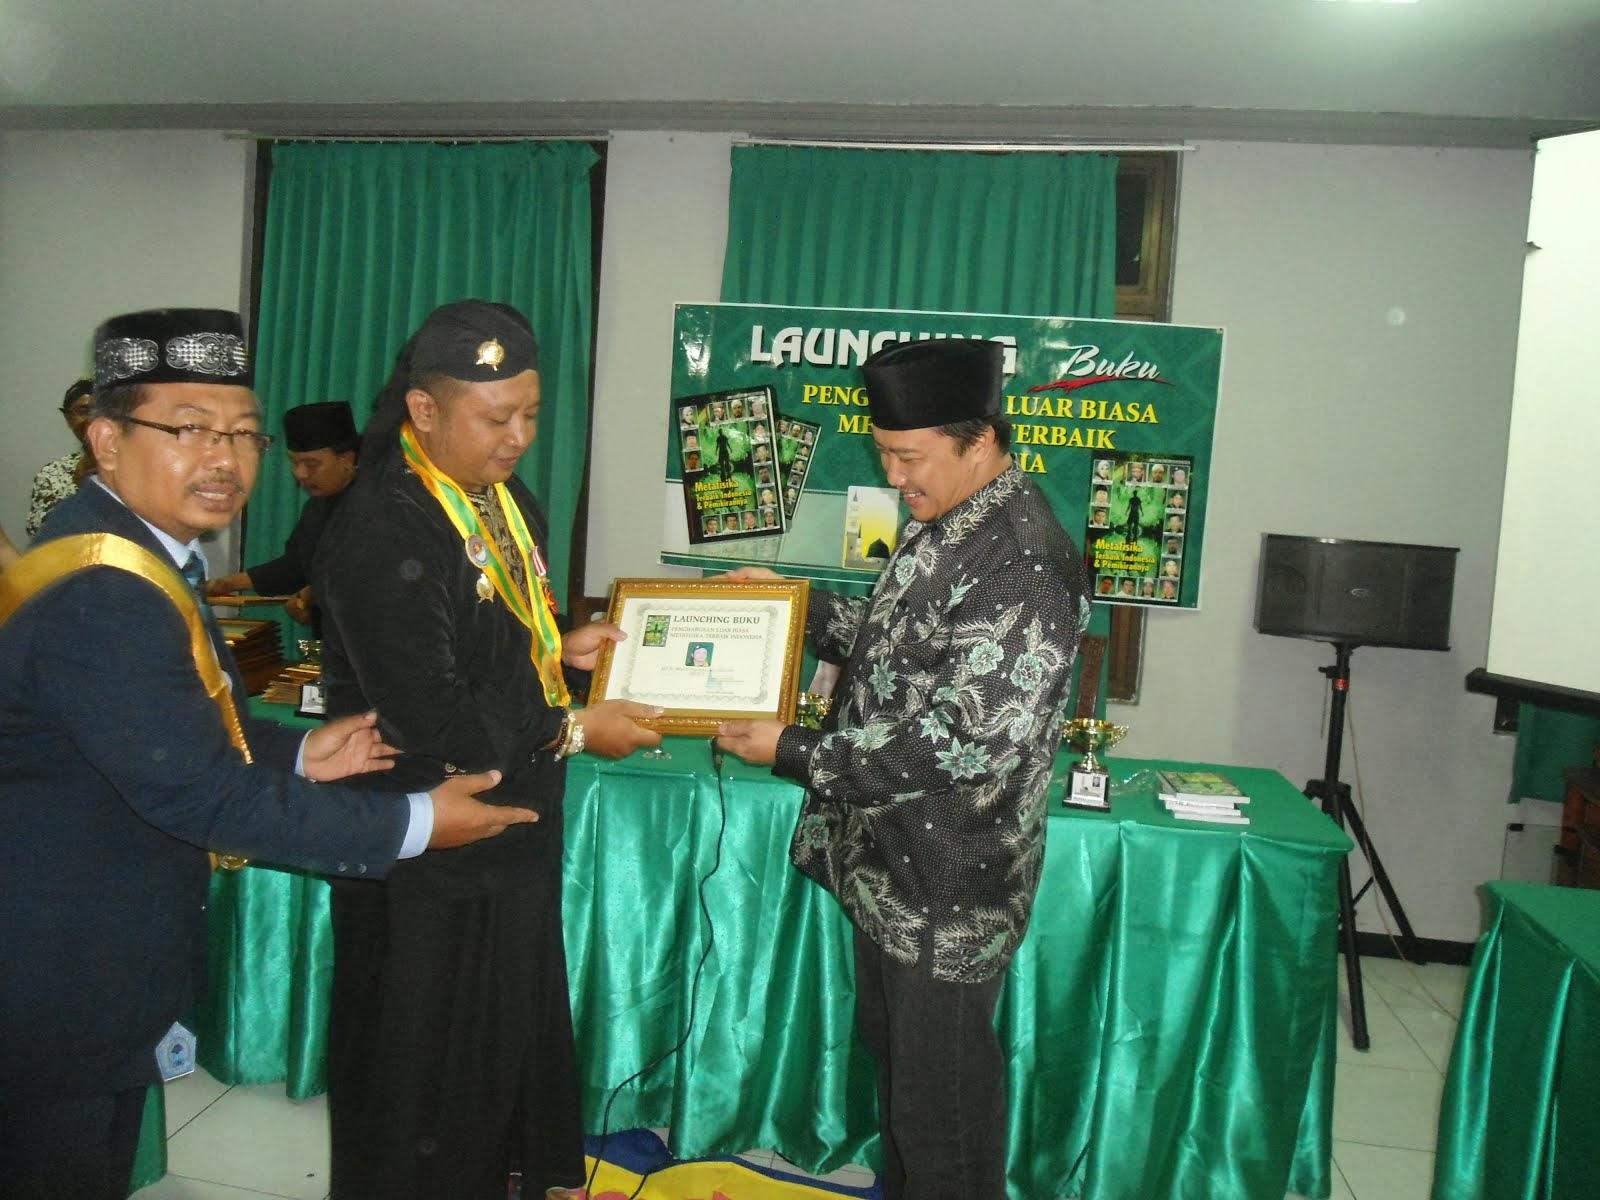 Pemberian Award sebagai salah satu Metafisikawan terbaik Indonesia 2014